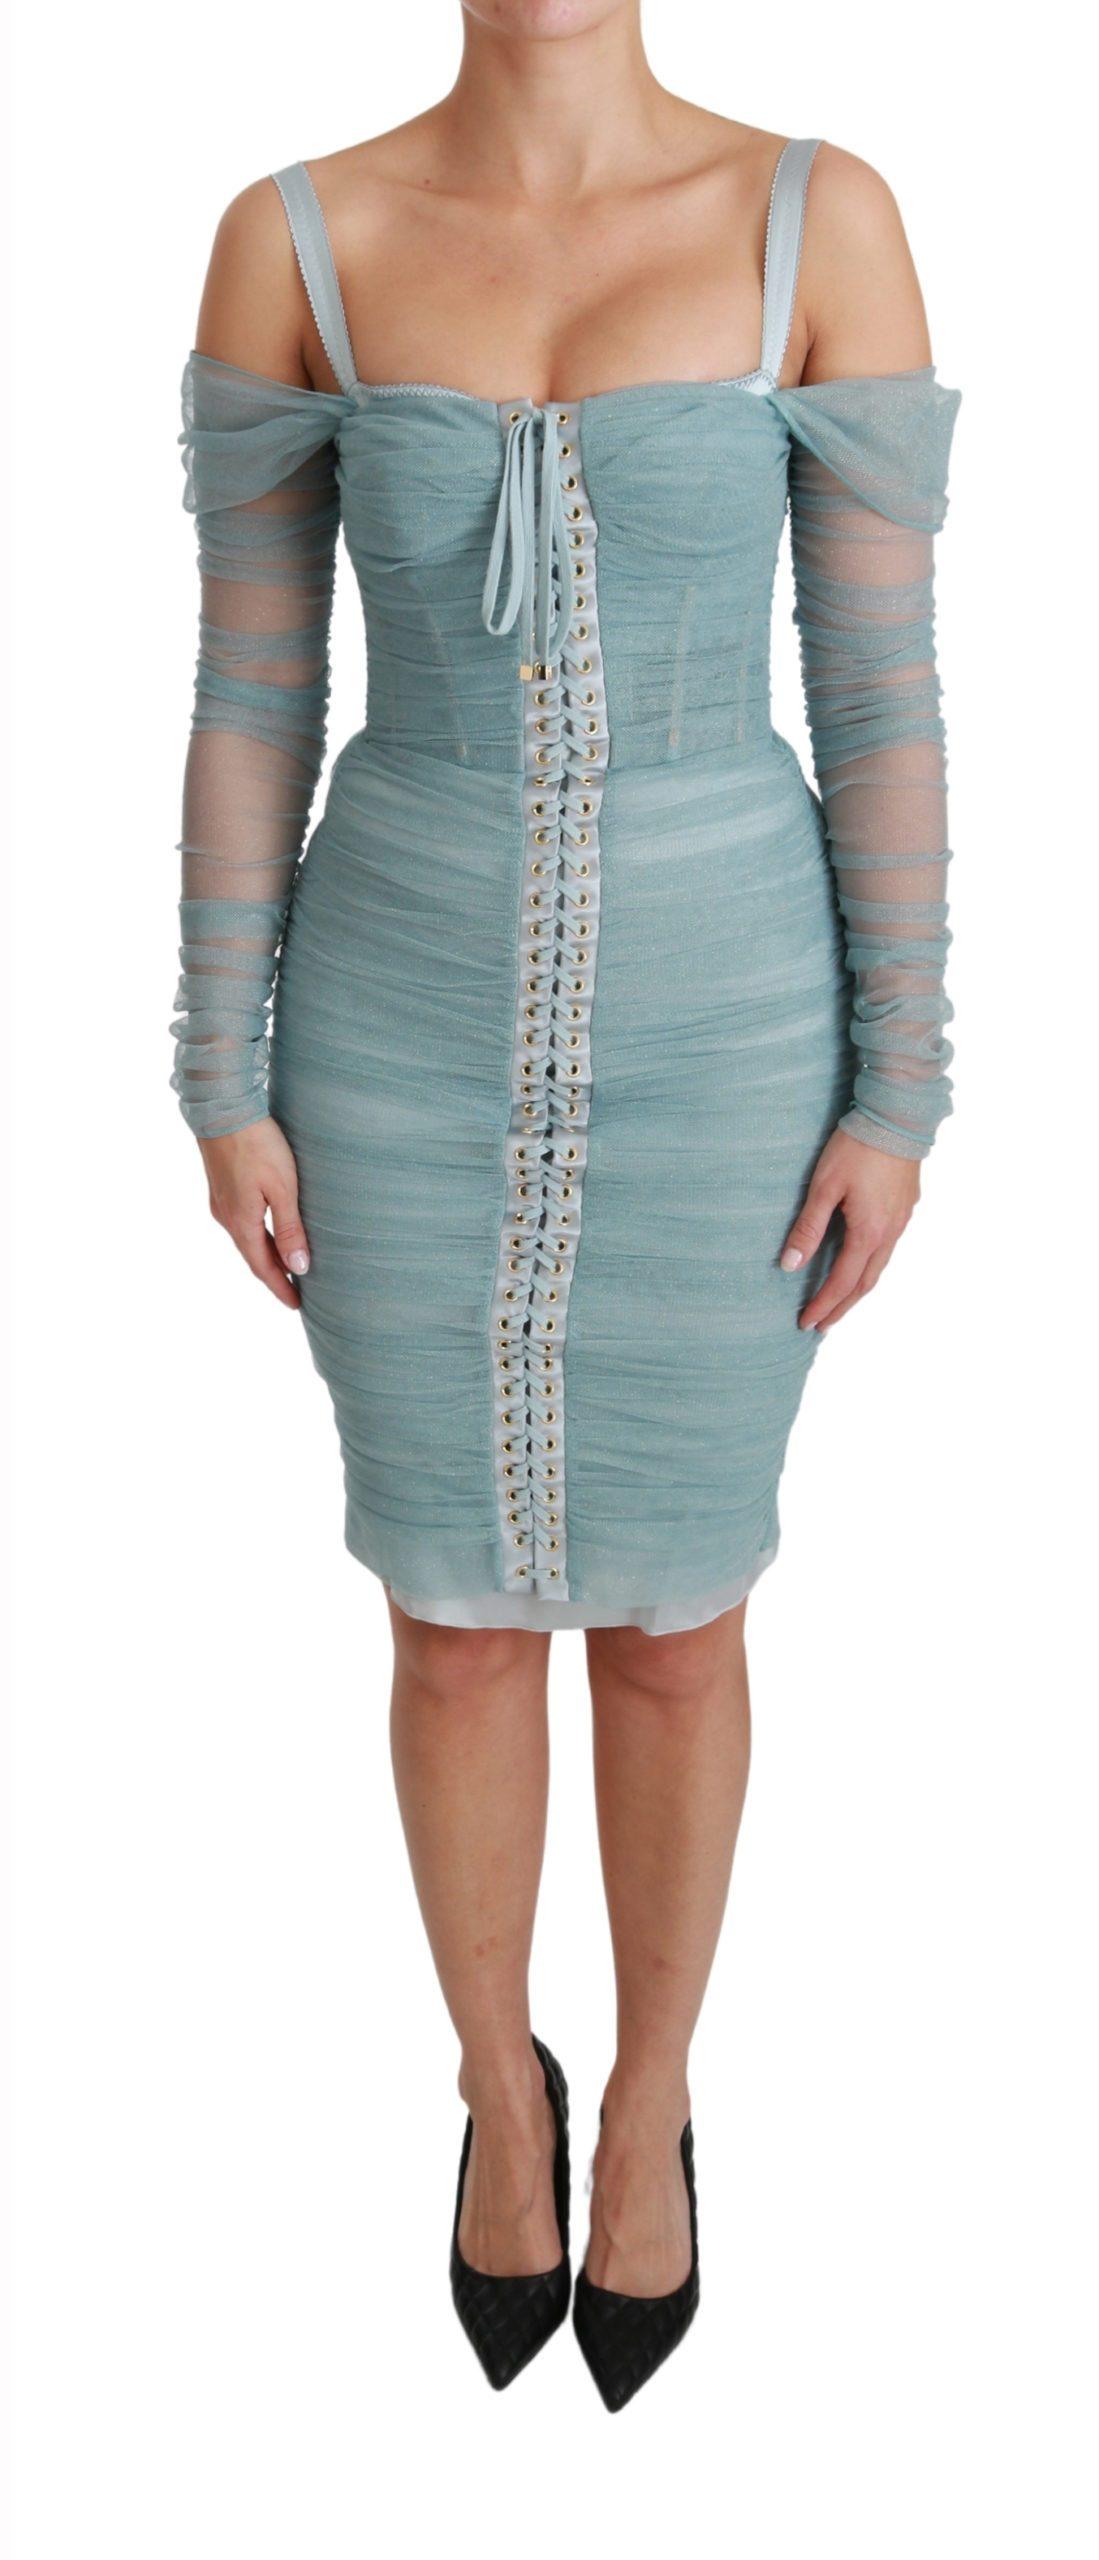 Dolce & Gabbana Women's LS Stretch Dress Blue DR2491 - IT42 M